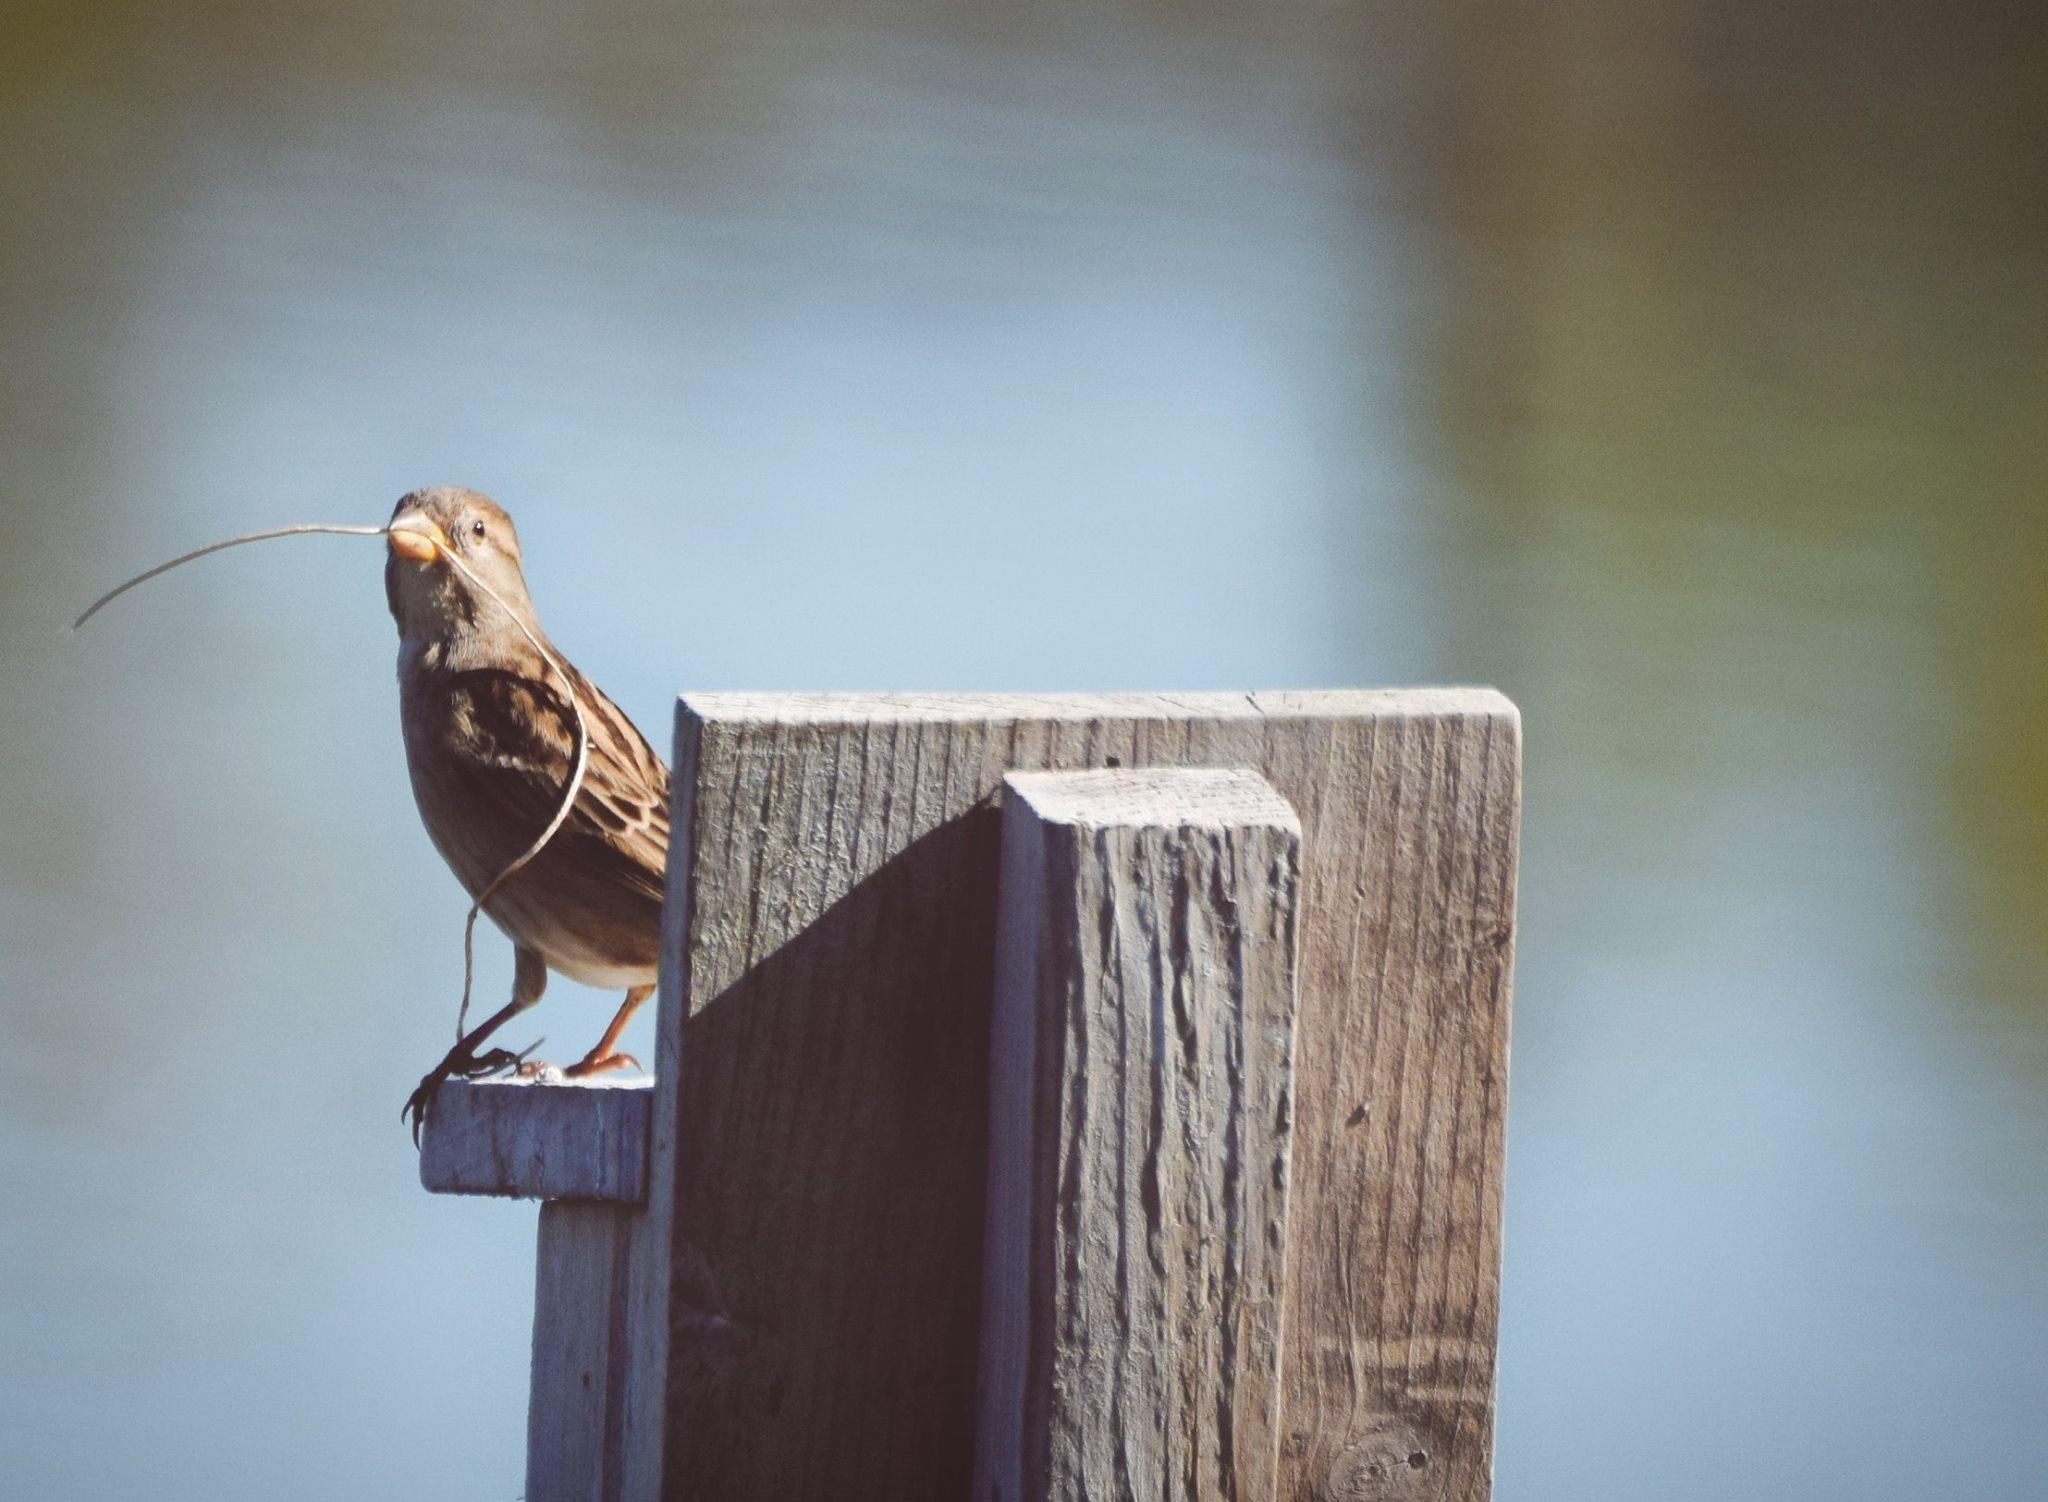 ceragno-house-sparrow-dekorte-10-15-16